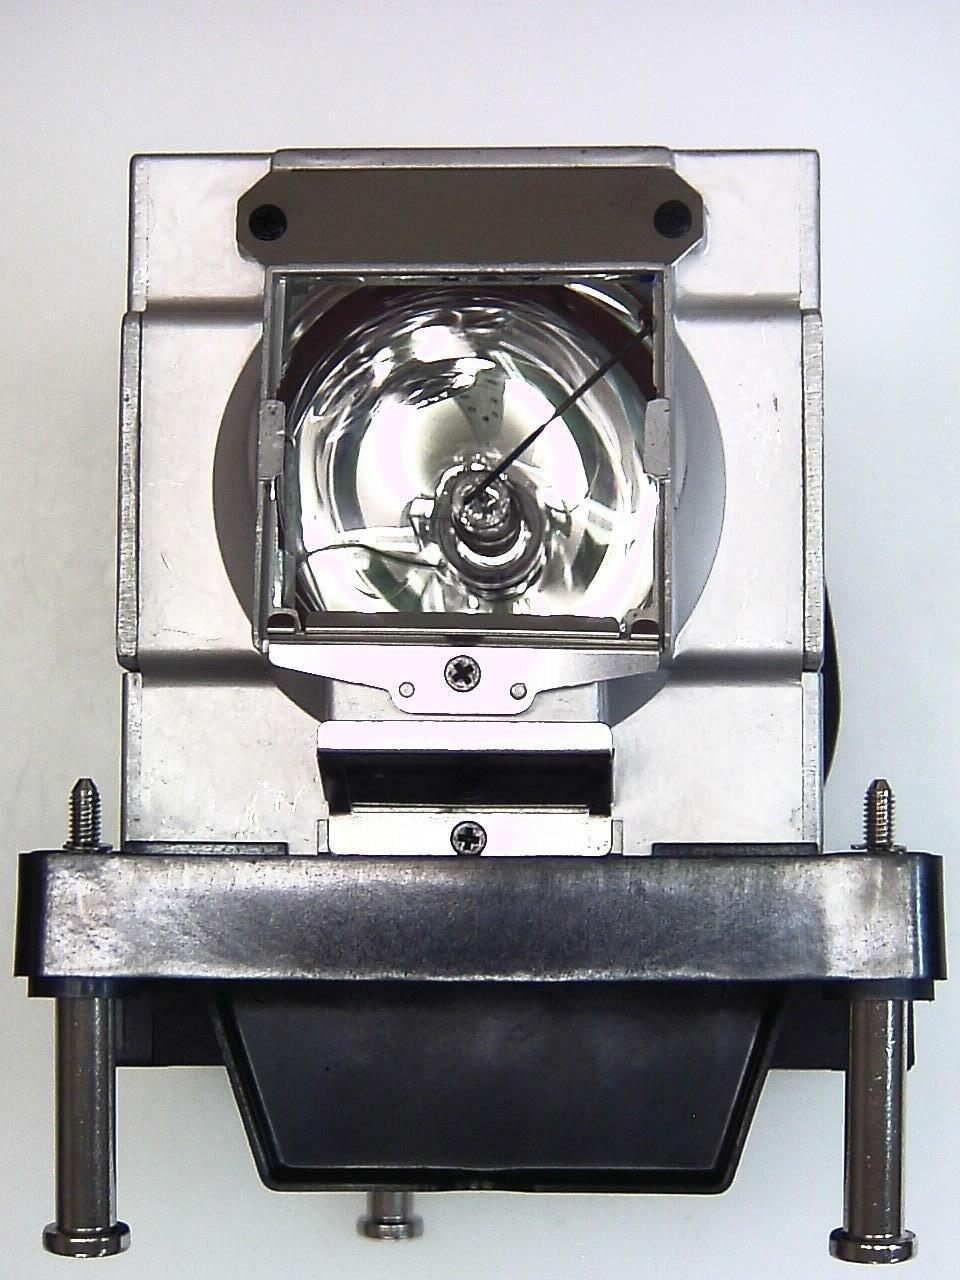 Original  Lámpara For DIGITAL PROJECTION EVISION 1080P-8000 Proyector.